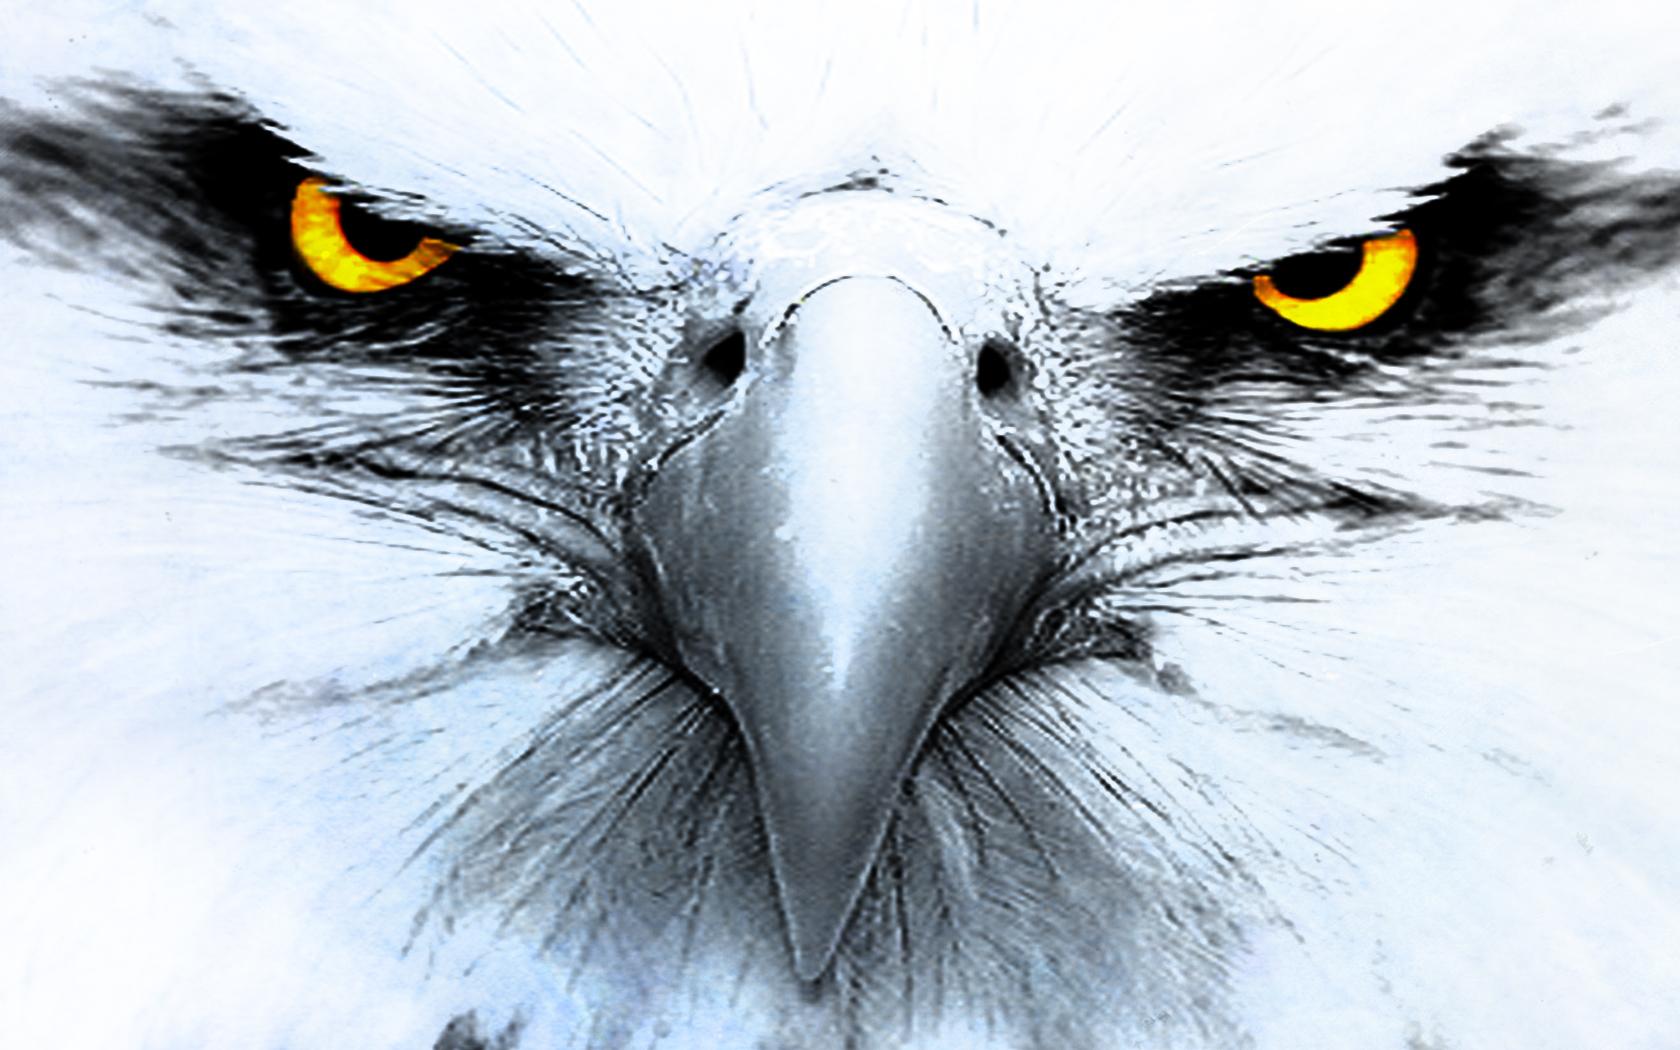 Eagle Computer Wallpapers Desktop Backgrounds 1680x1050 ID150464 1680x1050